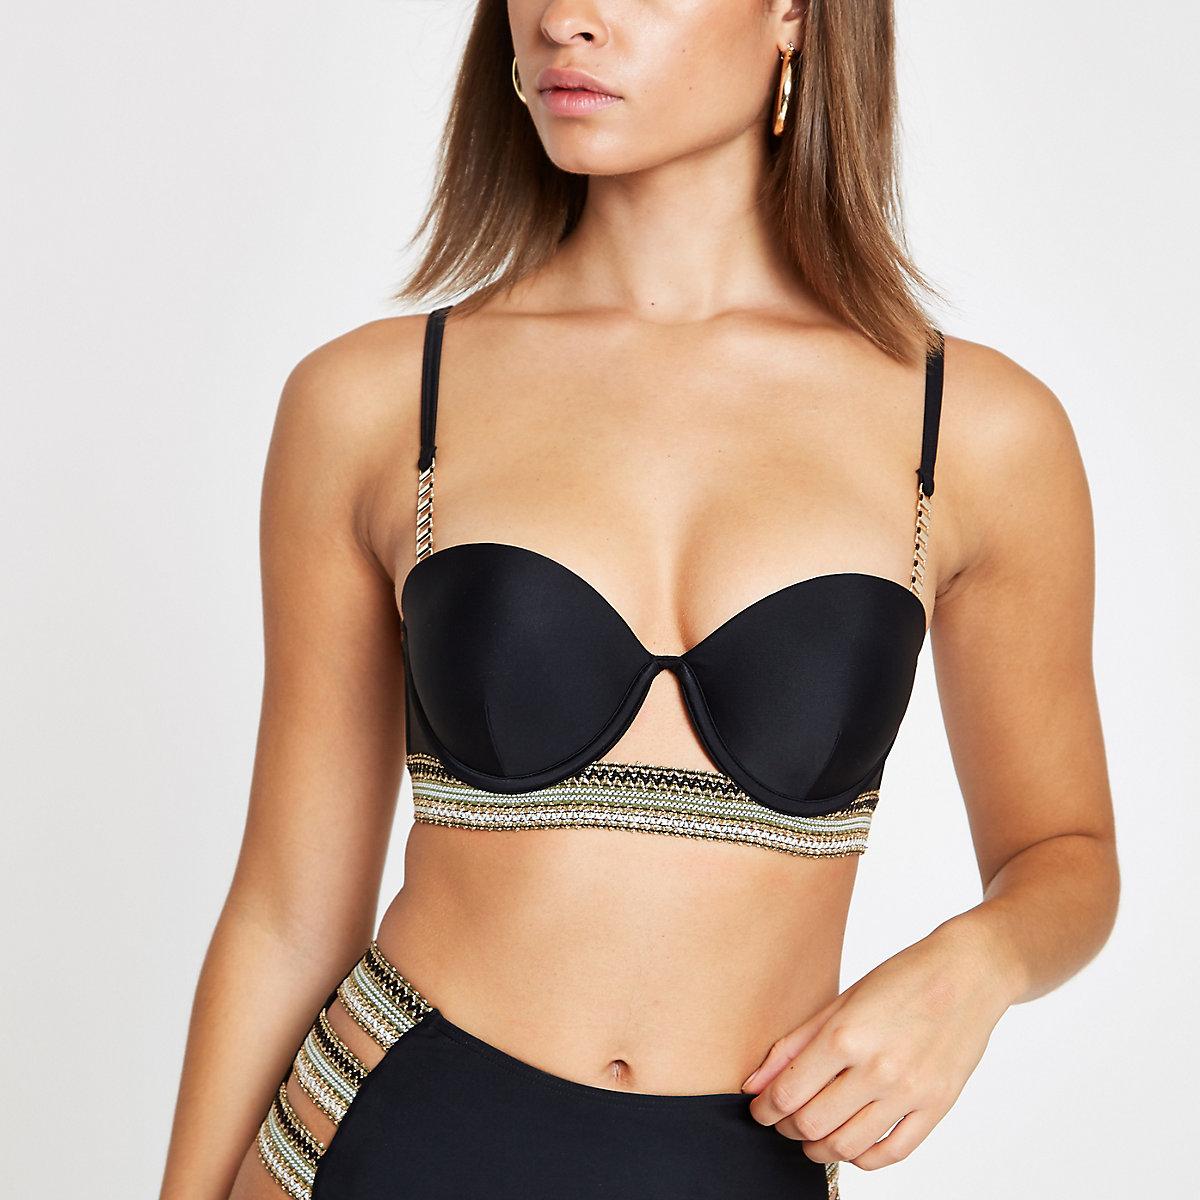 Black metallic trim balconette bikini top